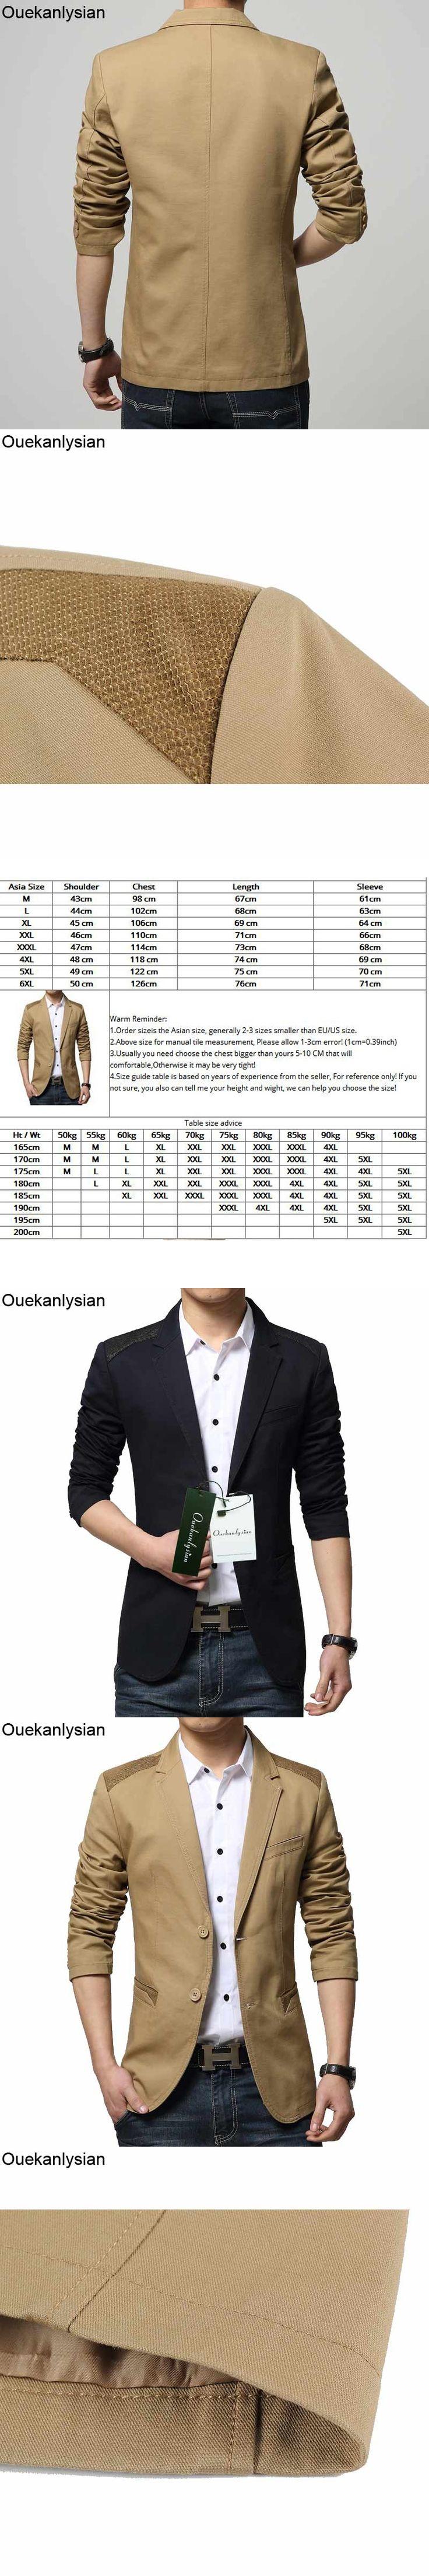 Ouekanlysian Casual Blazer Men Long Sleeve Cotton Slim Fitted Men's Blazer Suit Jacket Business Blazer Terno Masculino